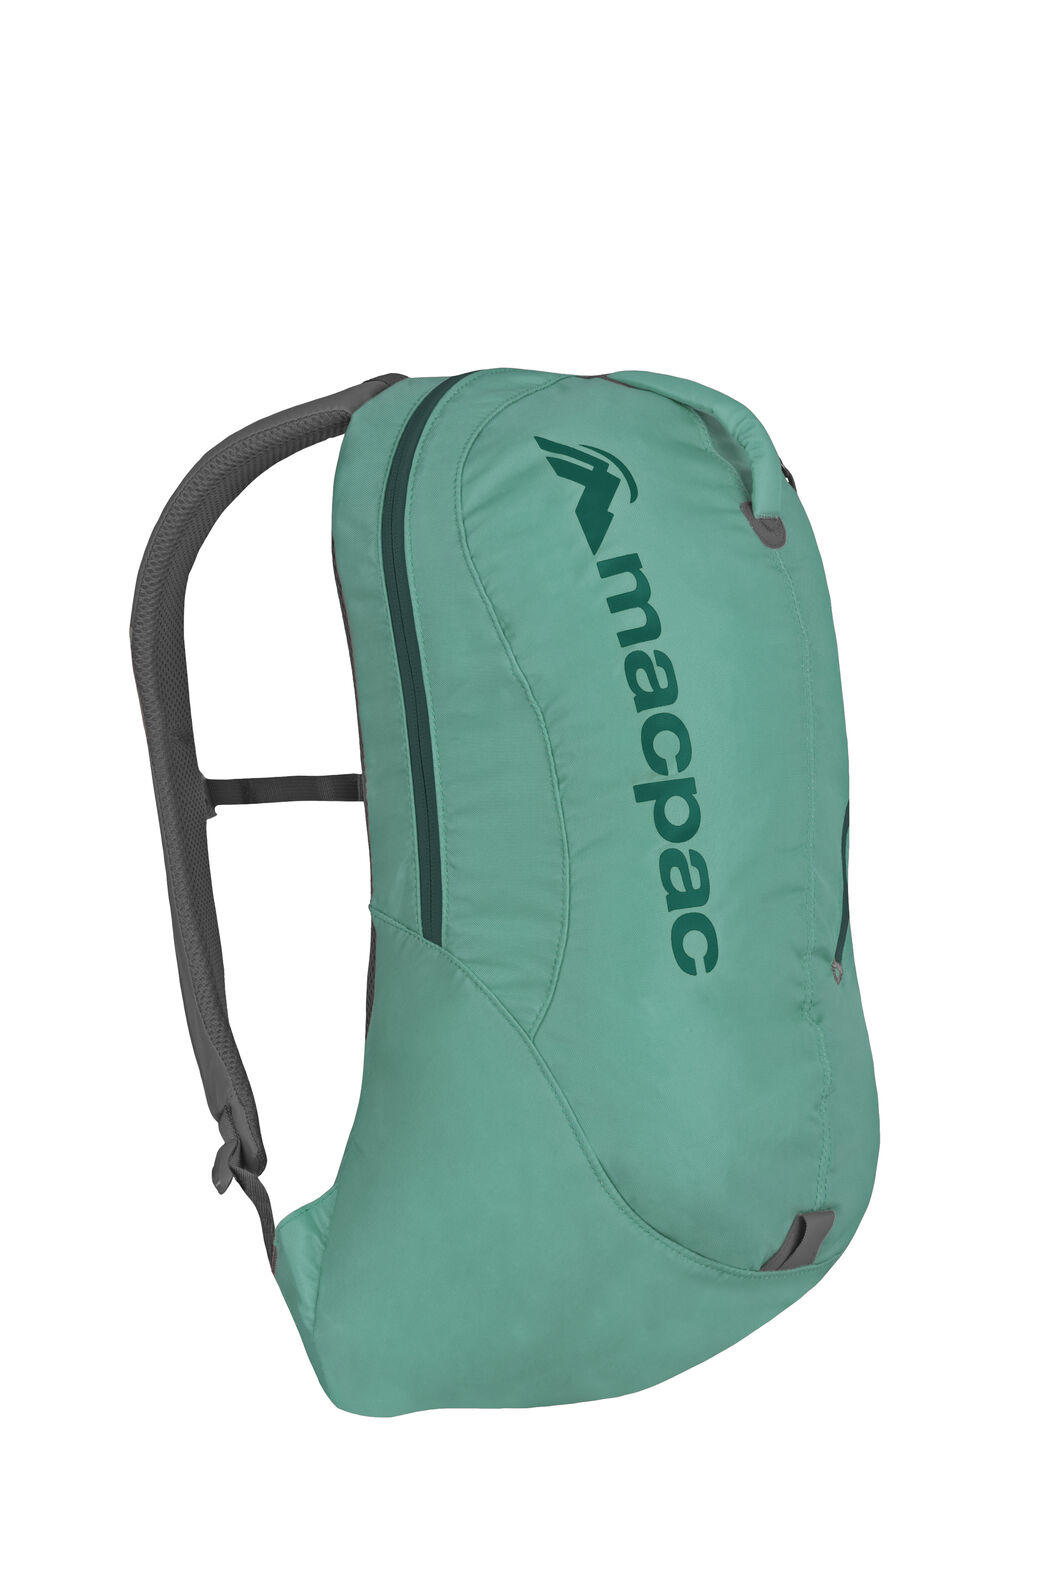 Macpac Kahuna 1.1 18L Backpack, Canton, hi-res